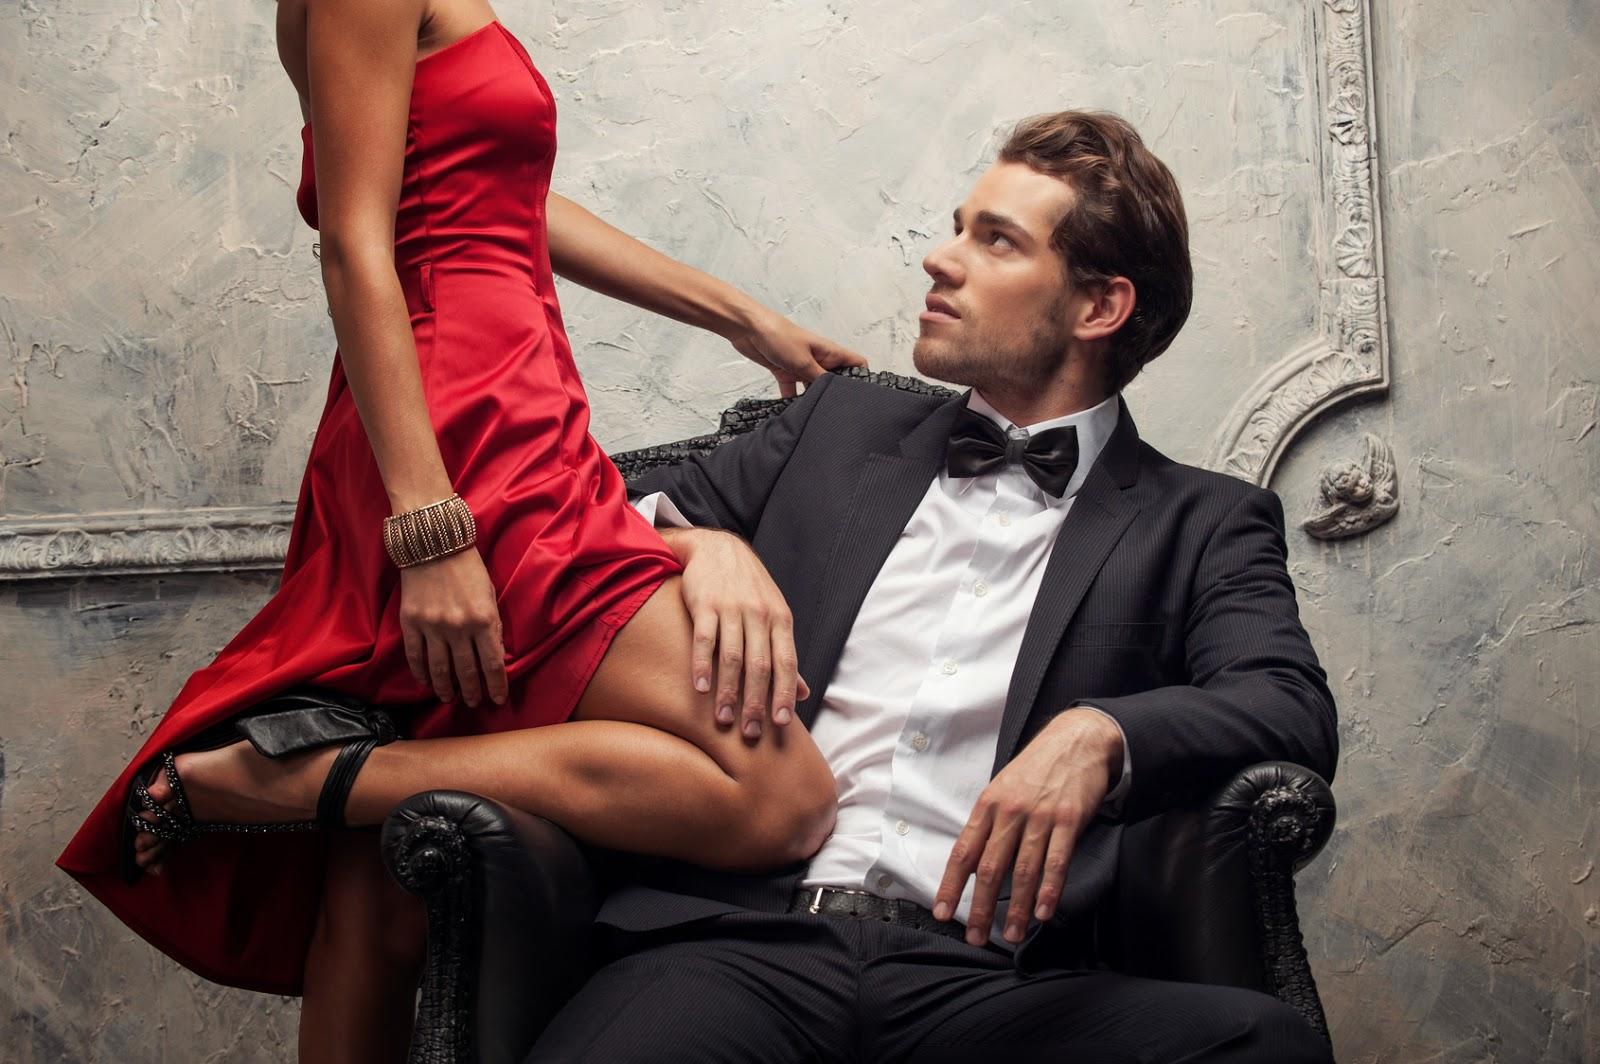 Как нравиться мужчинам Psychology and the city 51